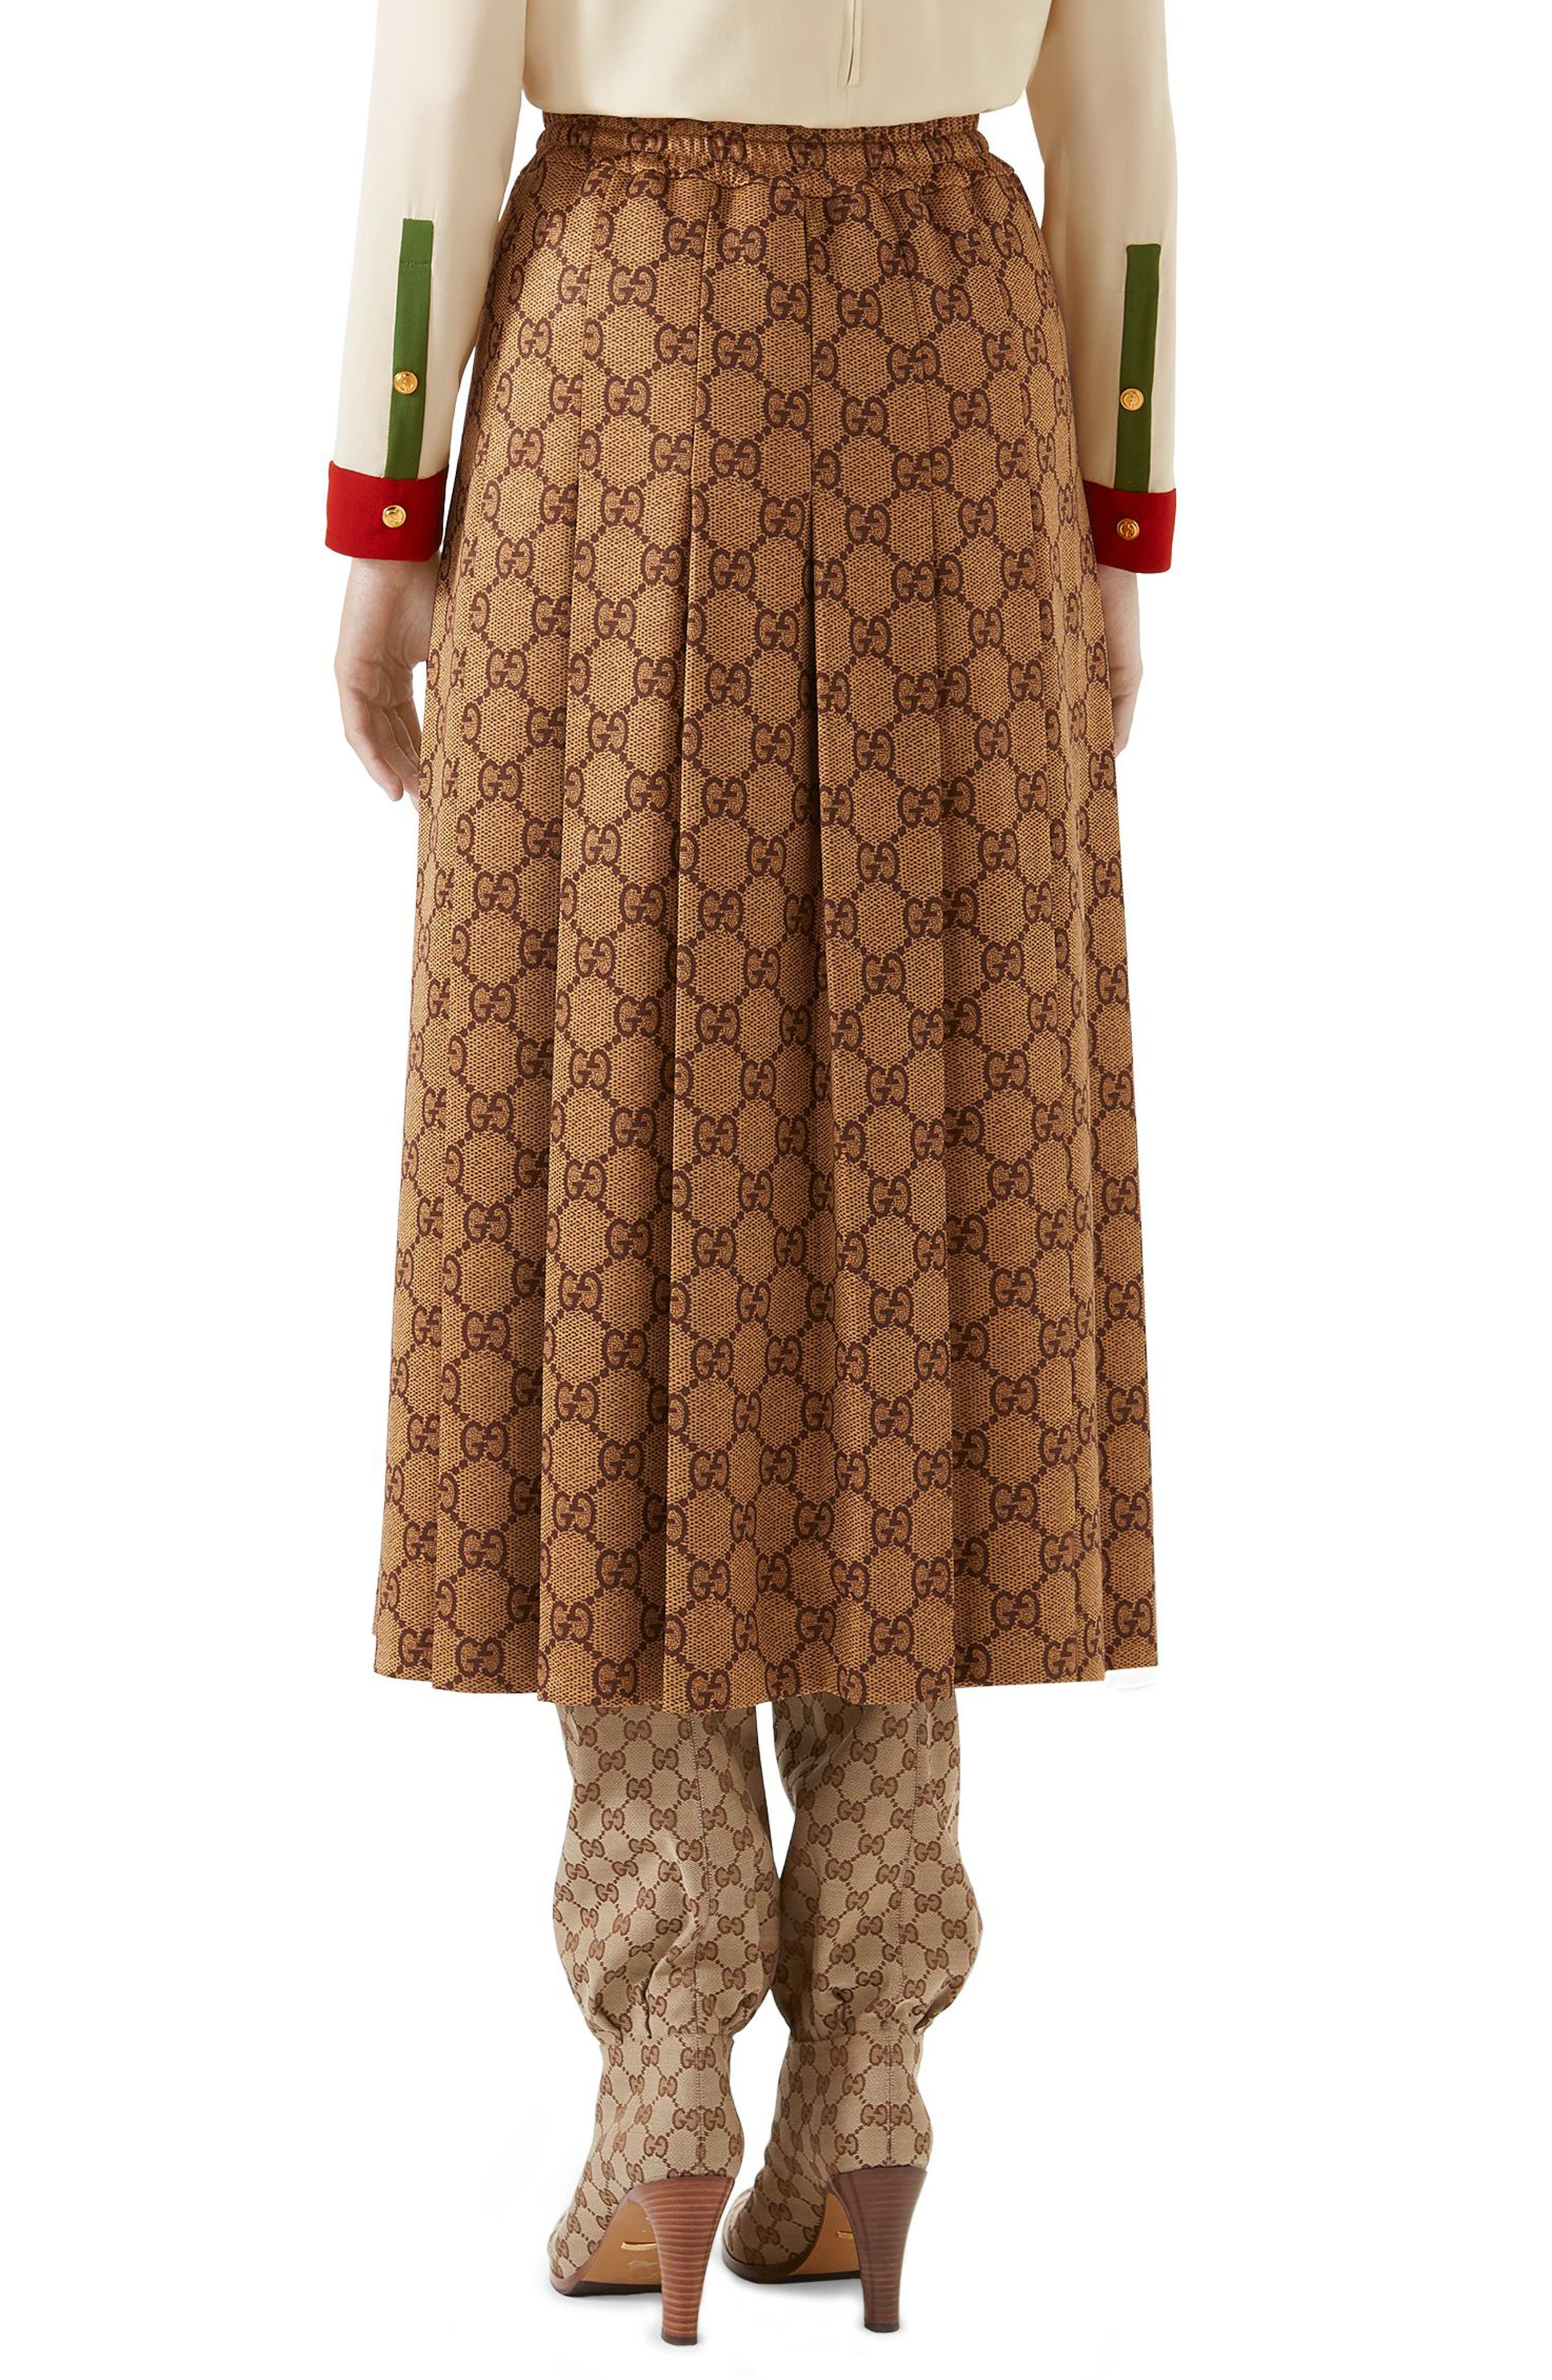 GG Print Pleated Midi Skirt,                             Alternate thumbnail 2, color,                             VINTAGE CAMEL